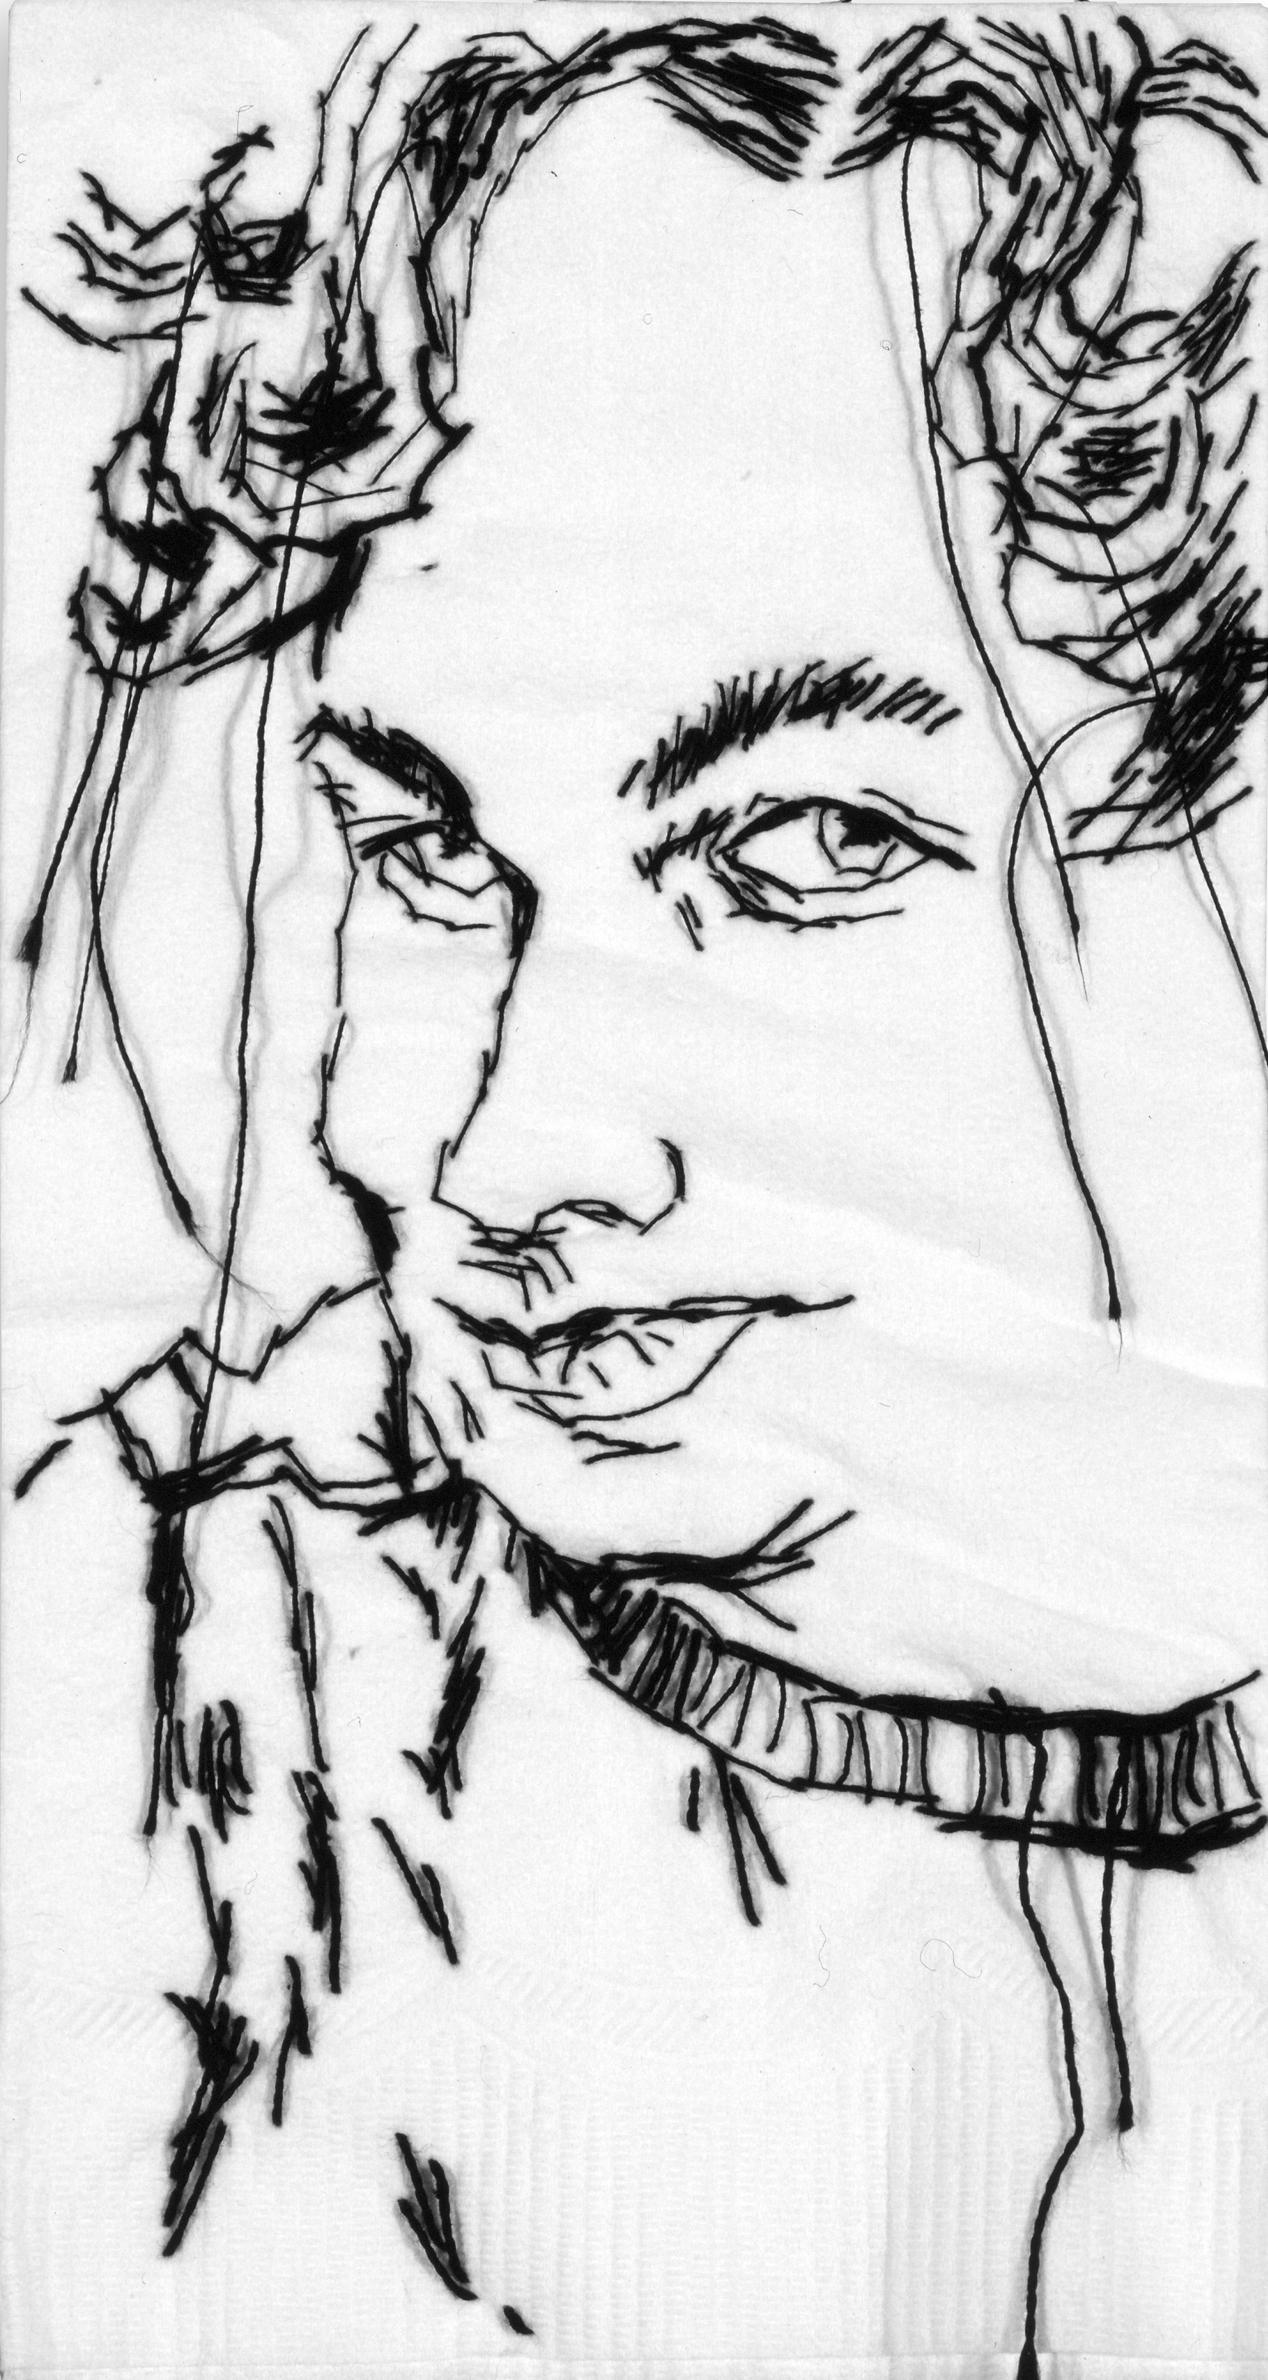 "Alex  Black thread on paper napkin, 7"" x 4"", 2005"